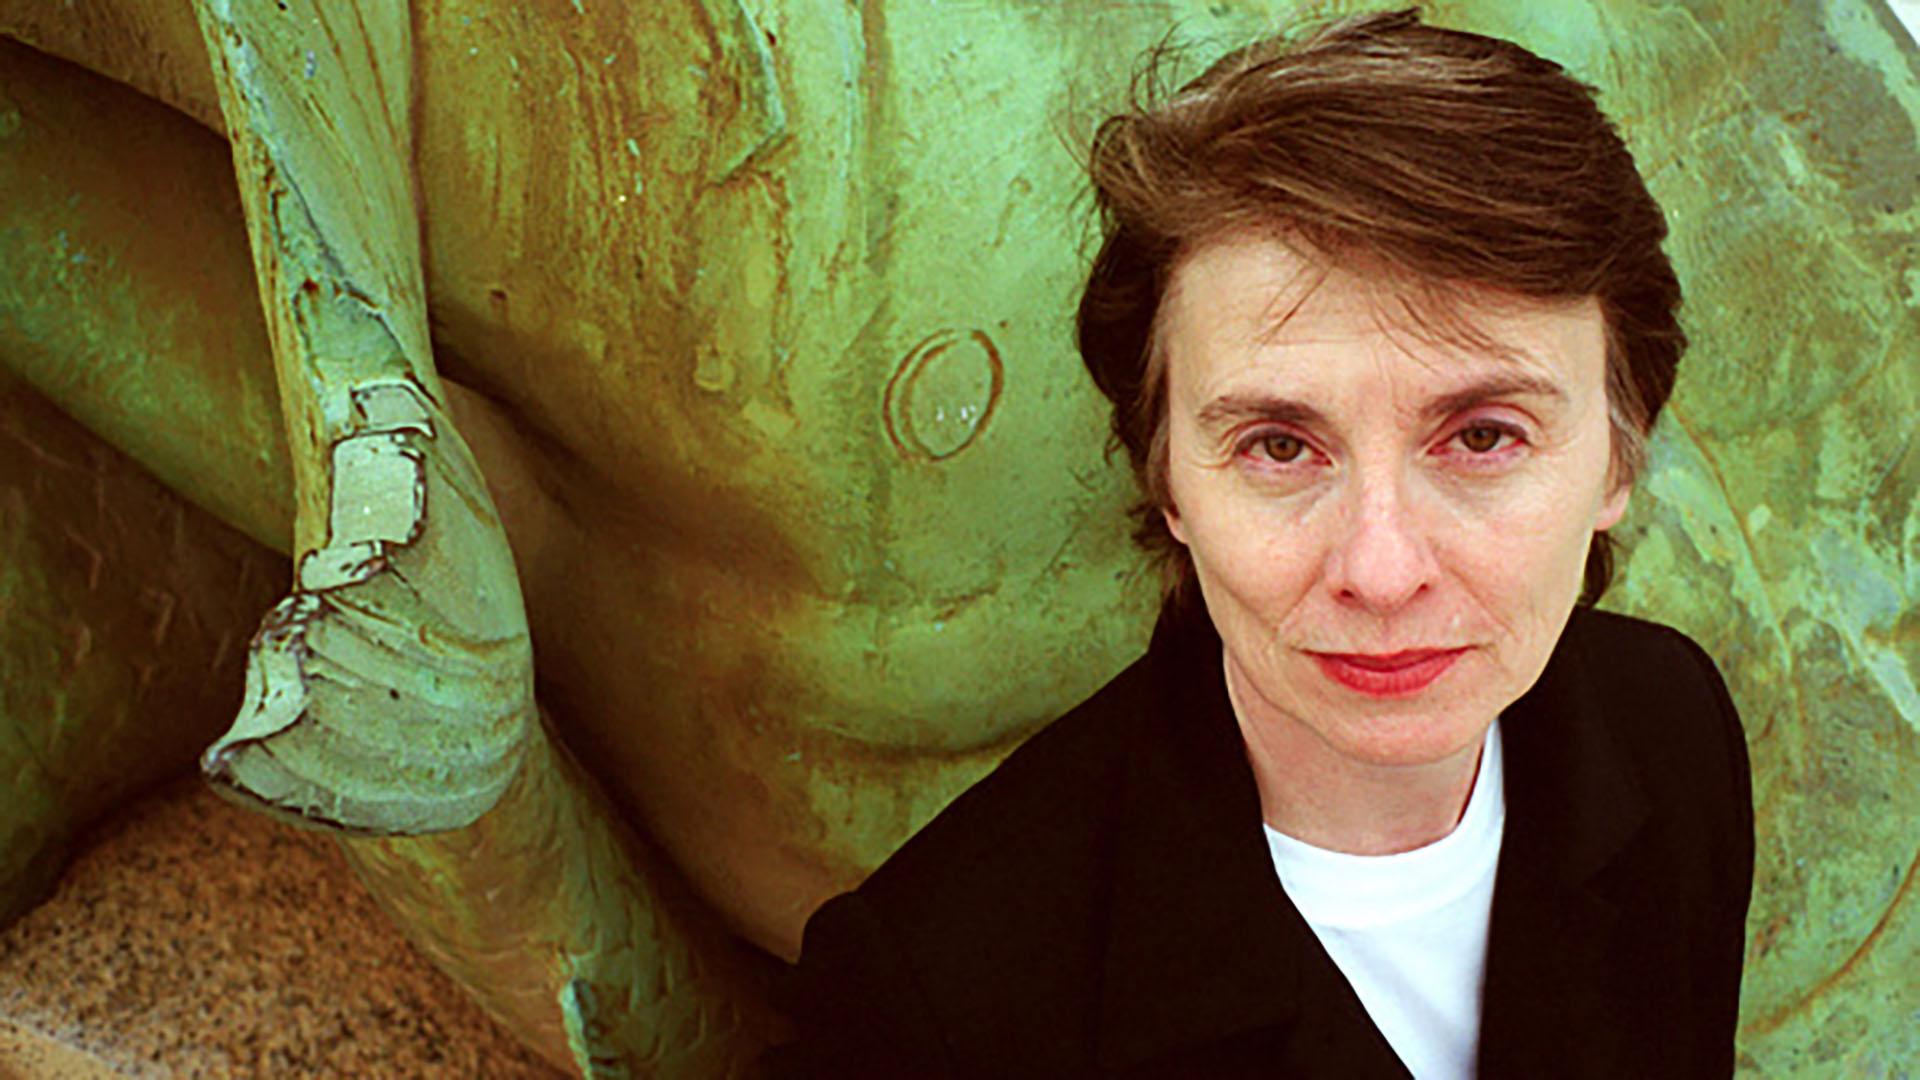 271e53c29 La intelectual feminista Camille Paglia presentó su nuevo libro Feminismo  pasado y presente (Getty Images